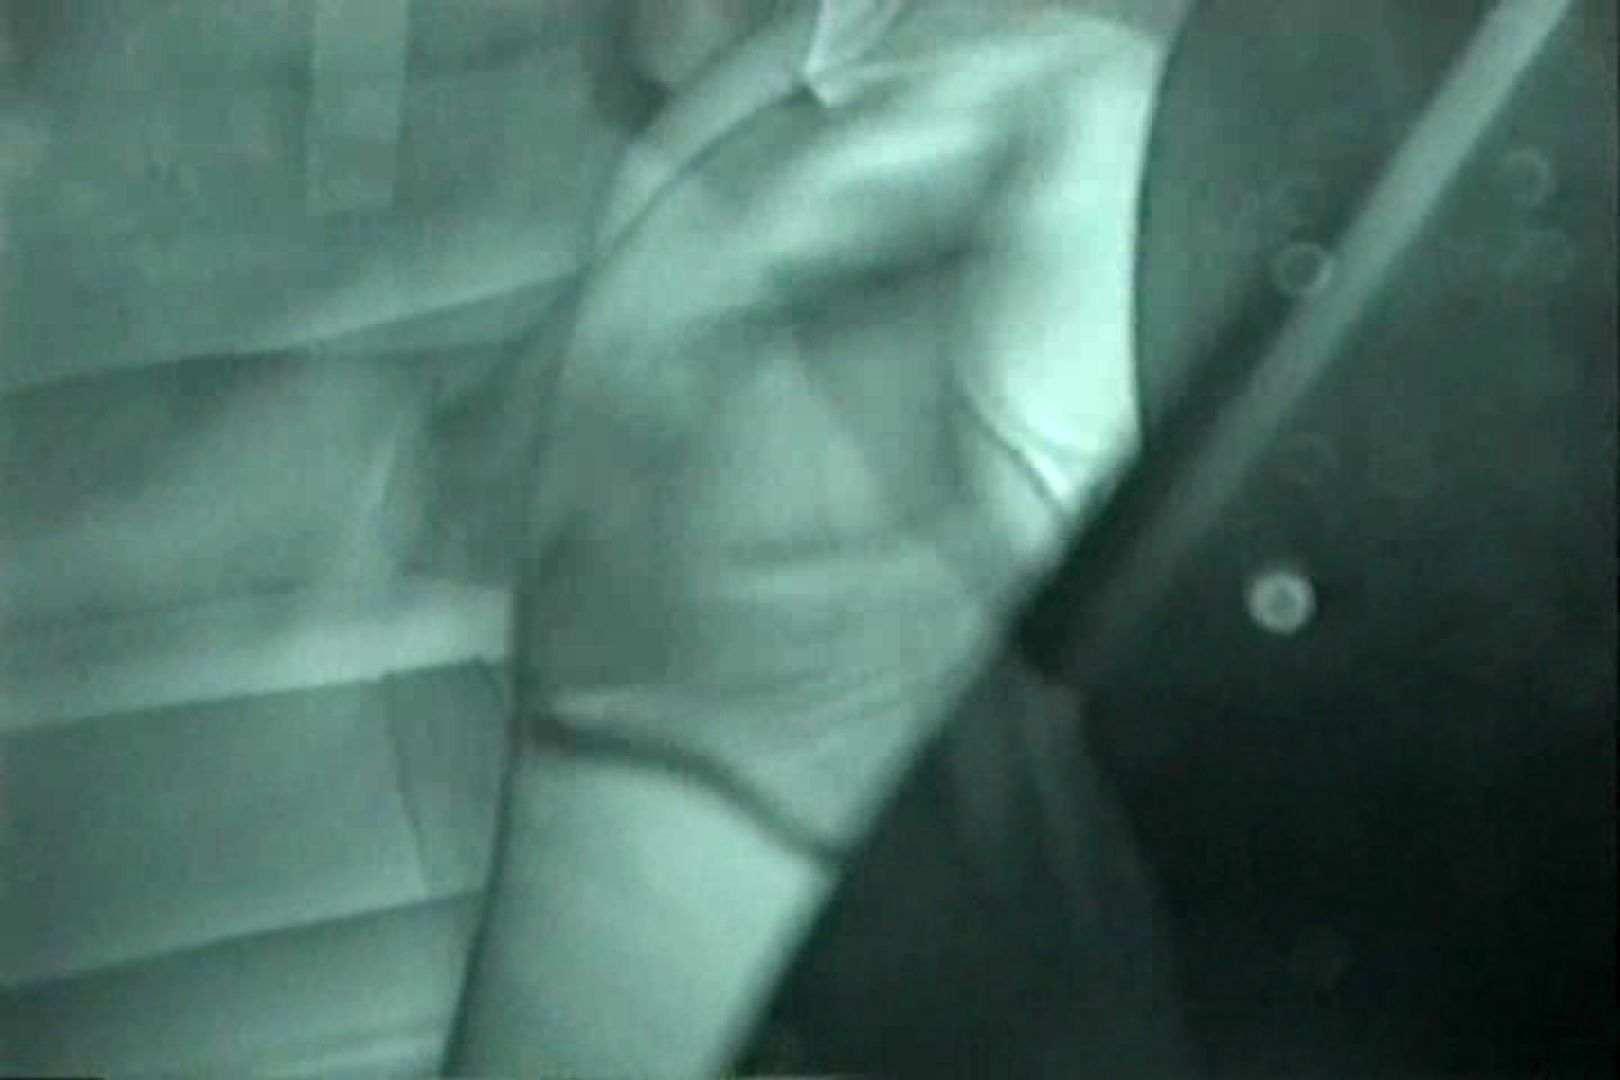 充血監督の深夜の運動会Vol.124 赤外線 オメコ無修正動画無料 97画像 59